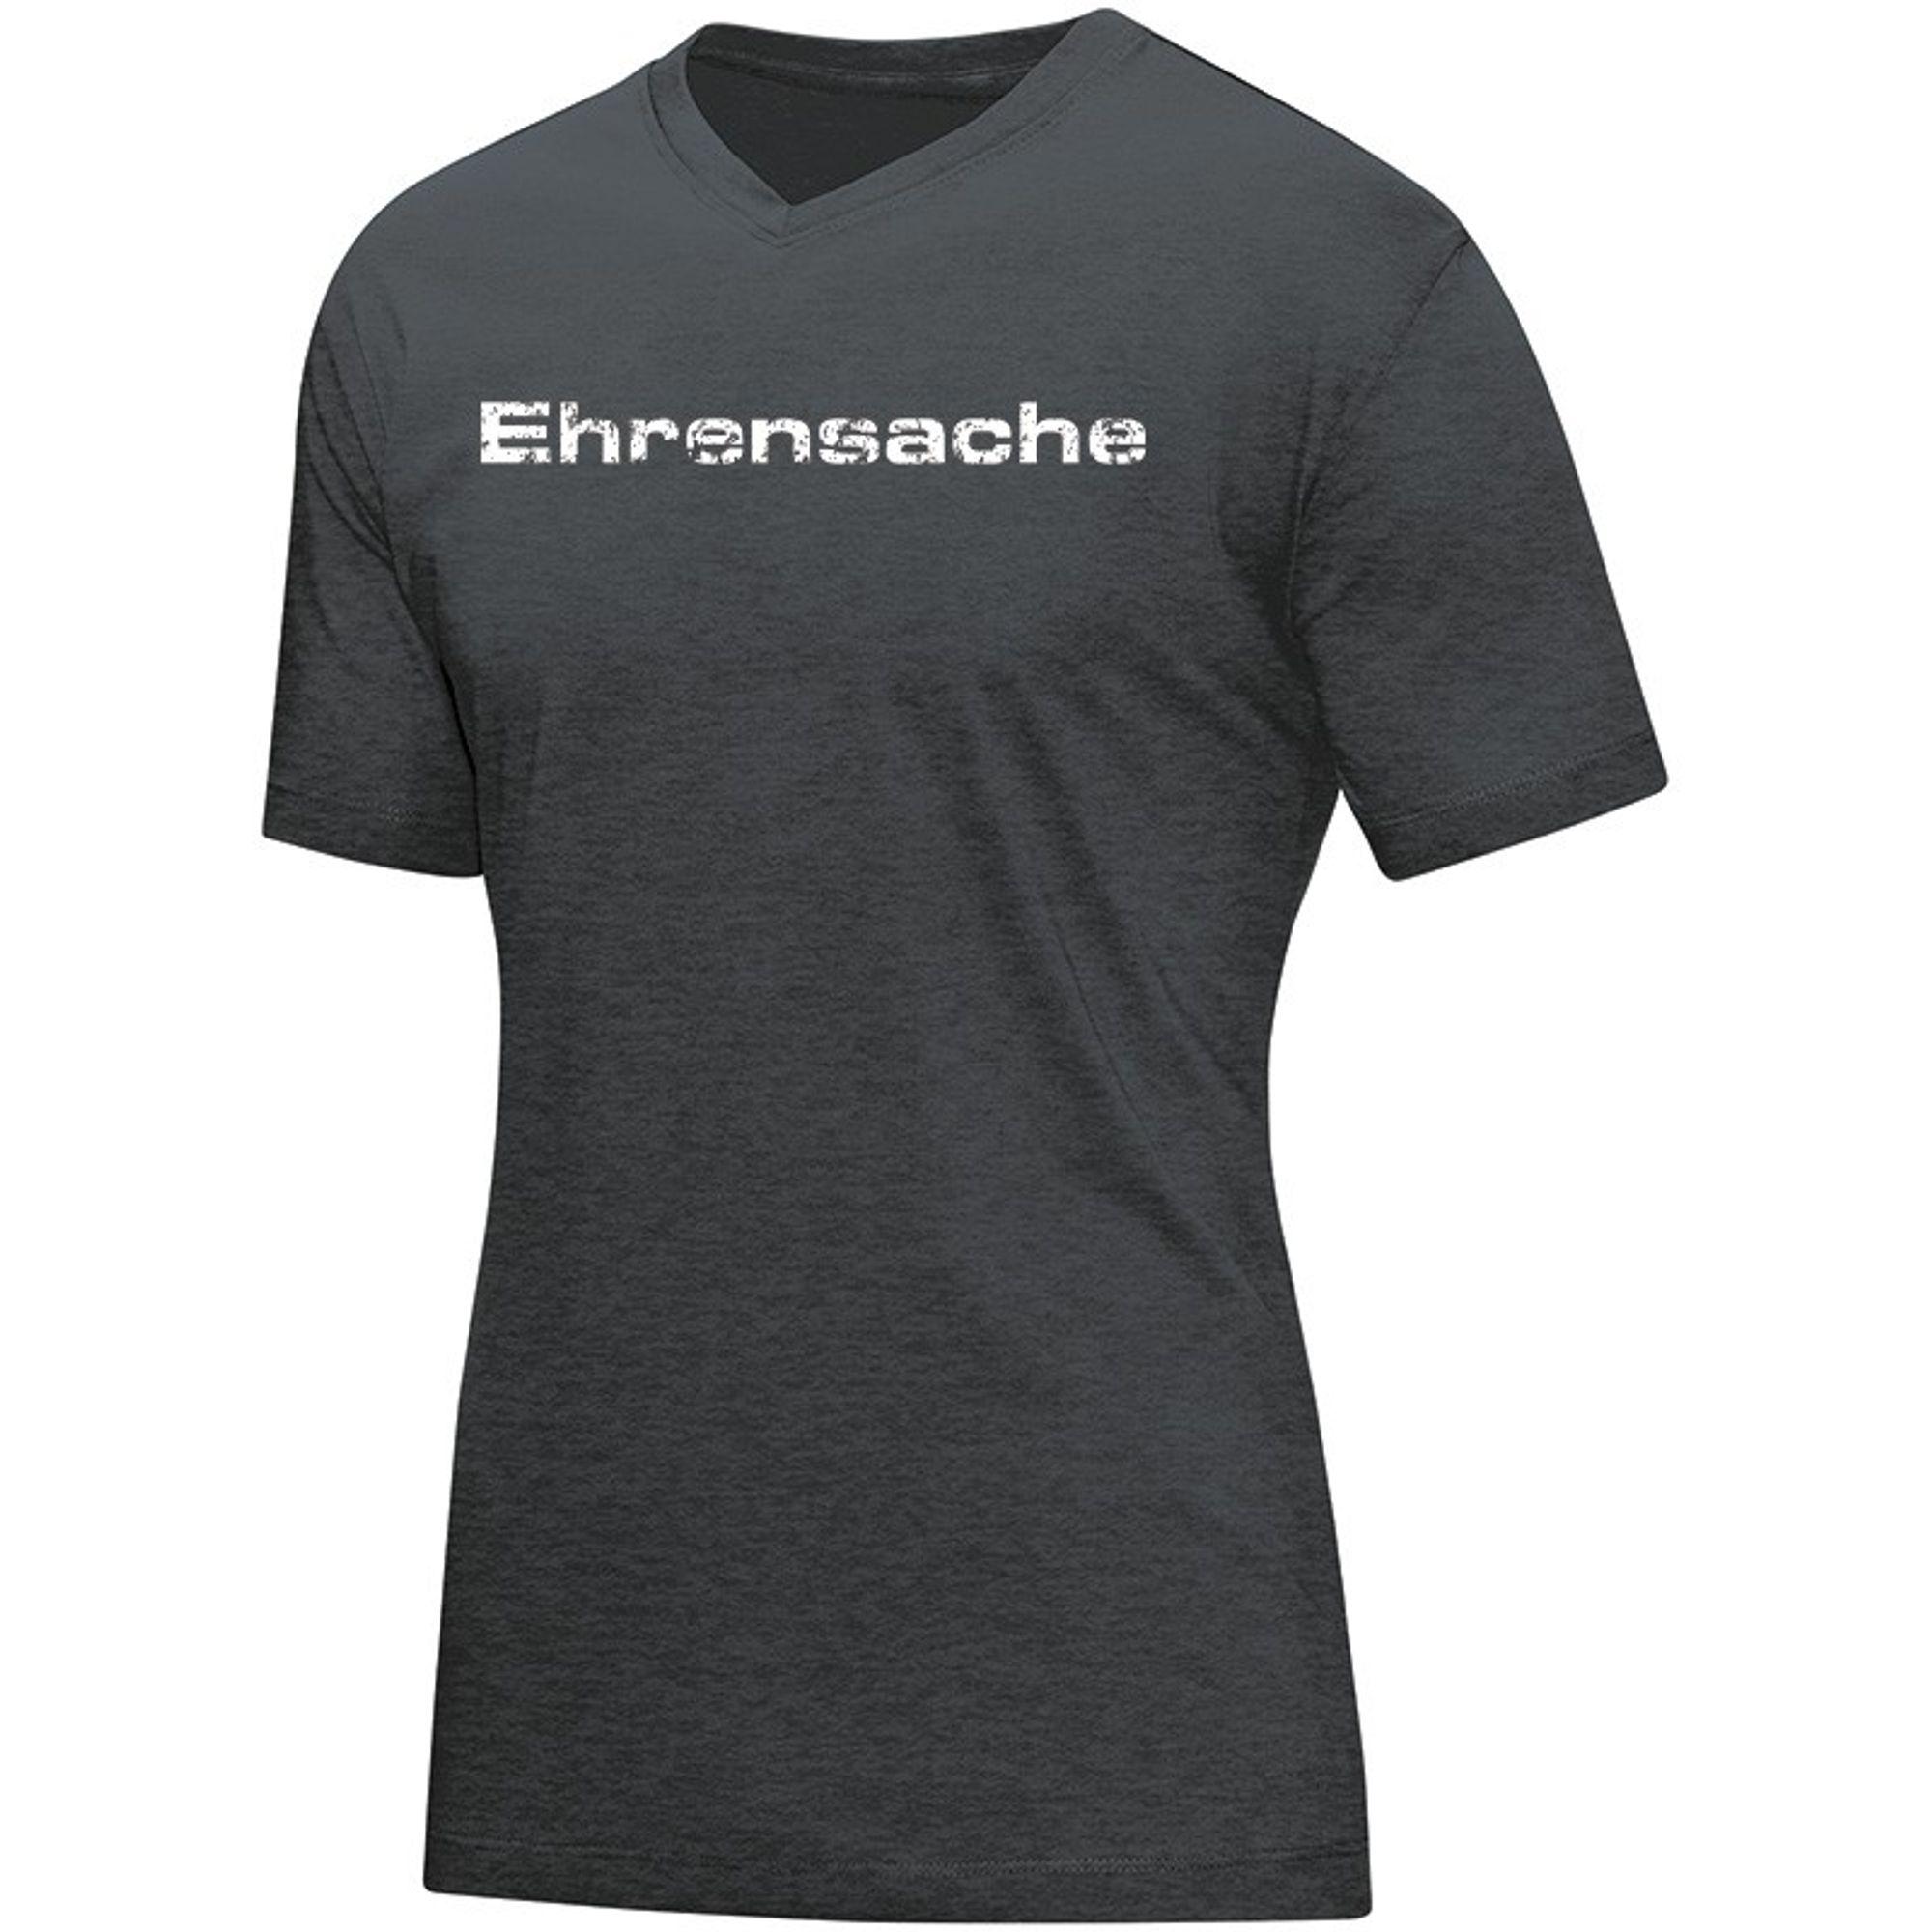 Jako Karlsruher Sc T-Shirt Ehrensache - anthrazit